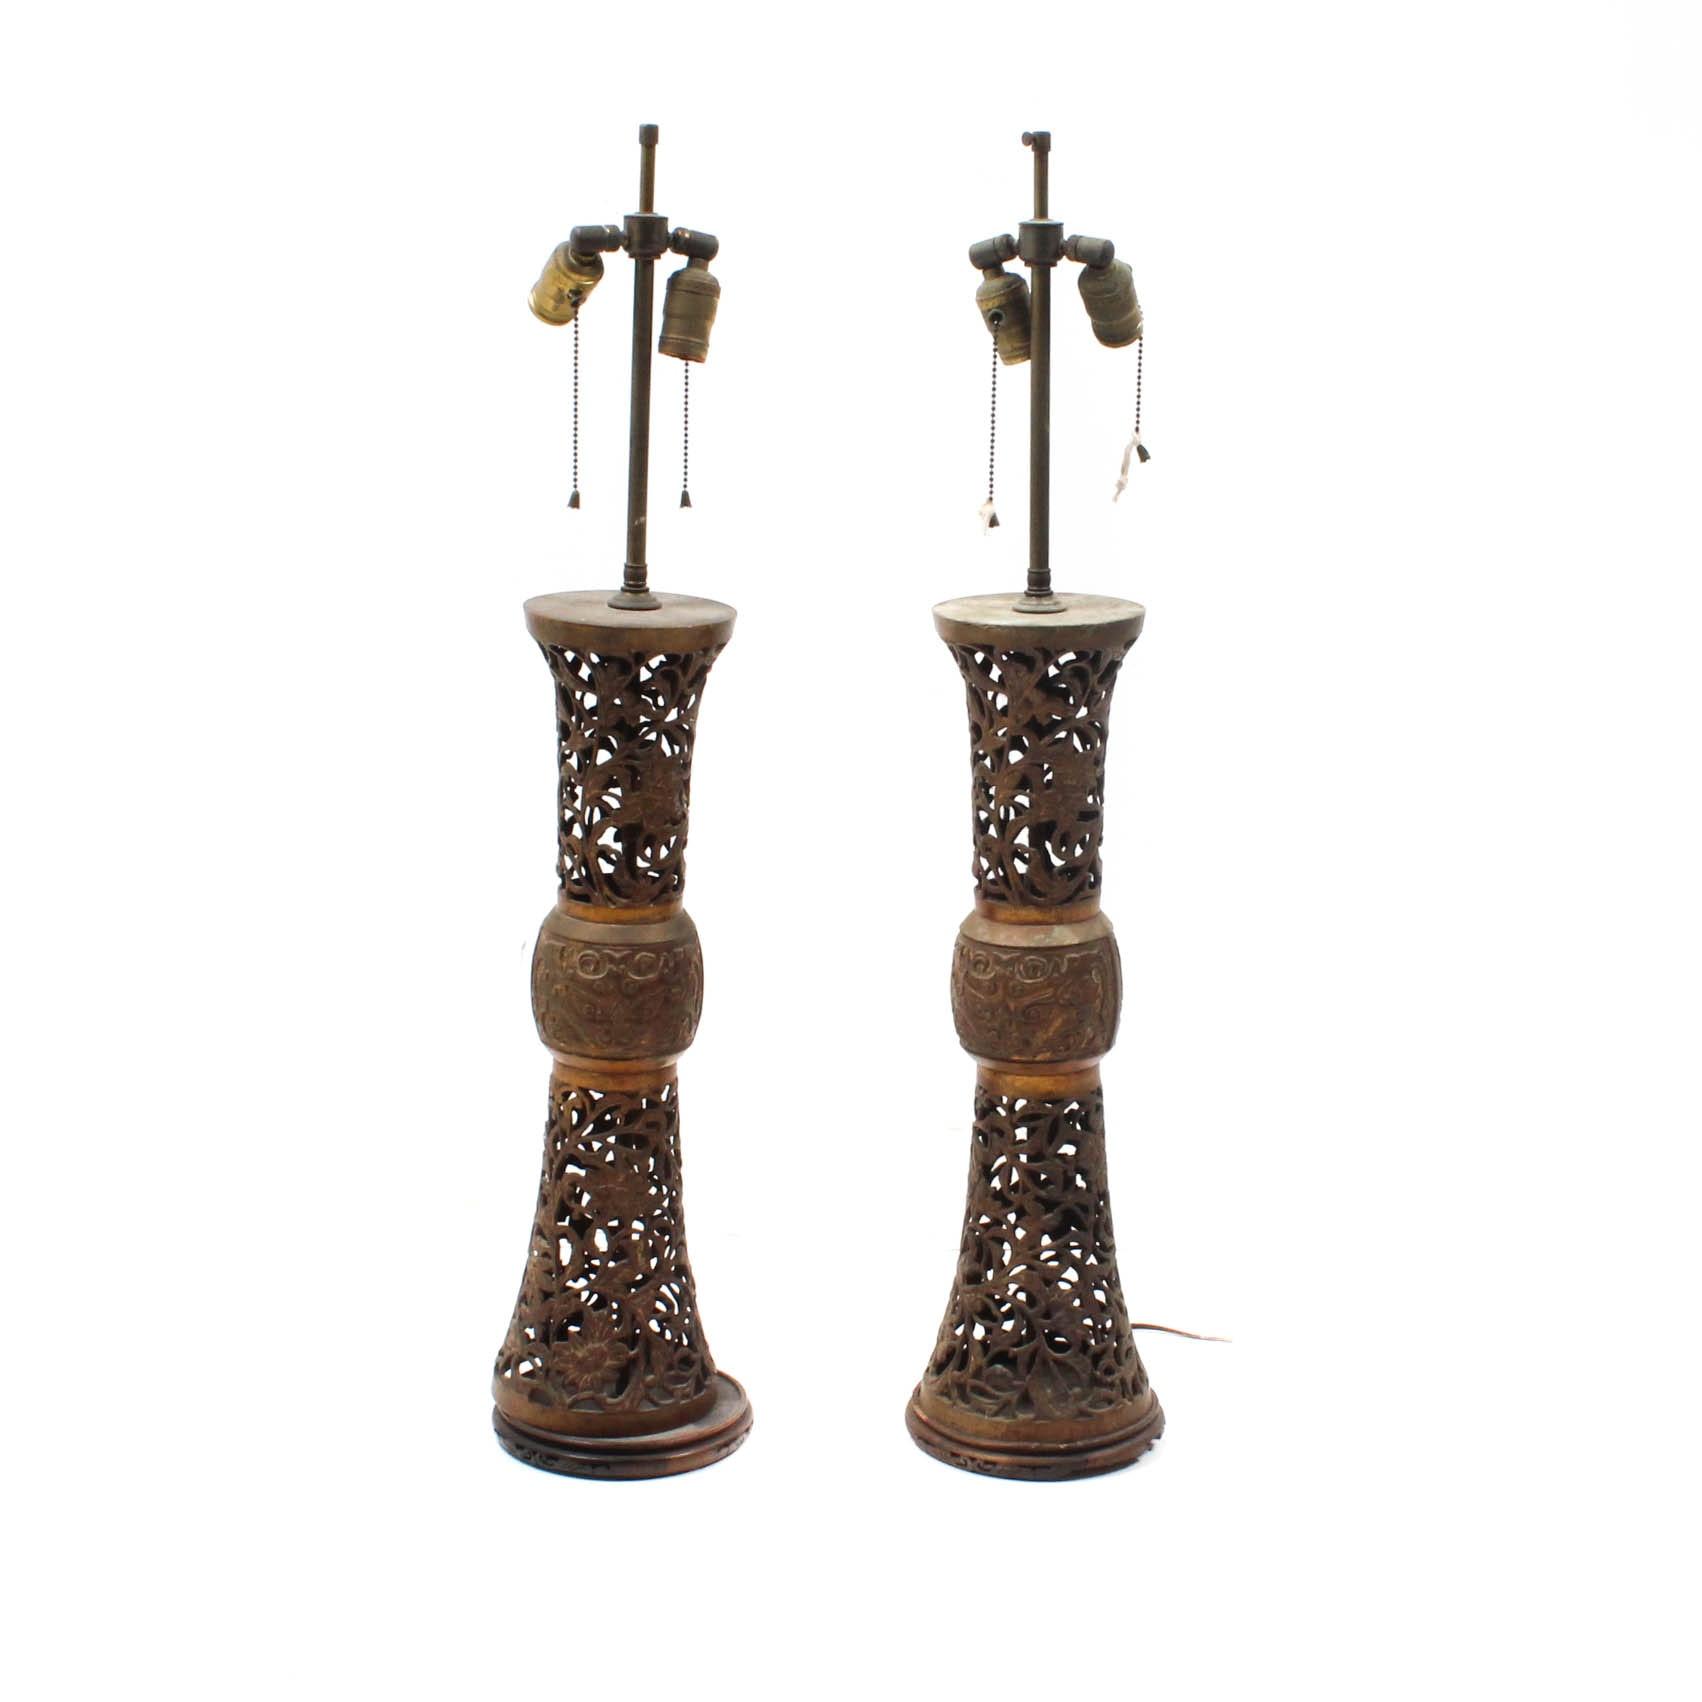 Chinese Reticulated Metal Gu Vase Lamps